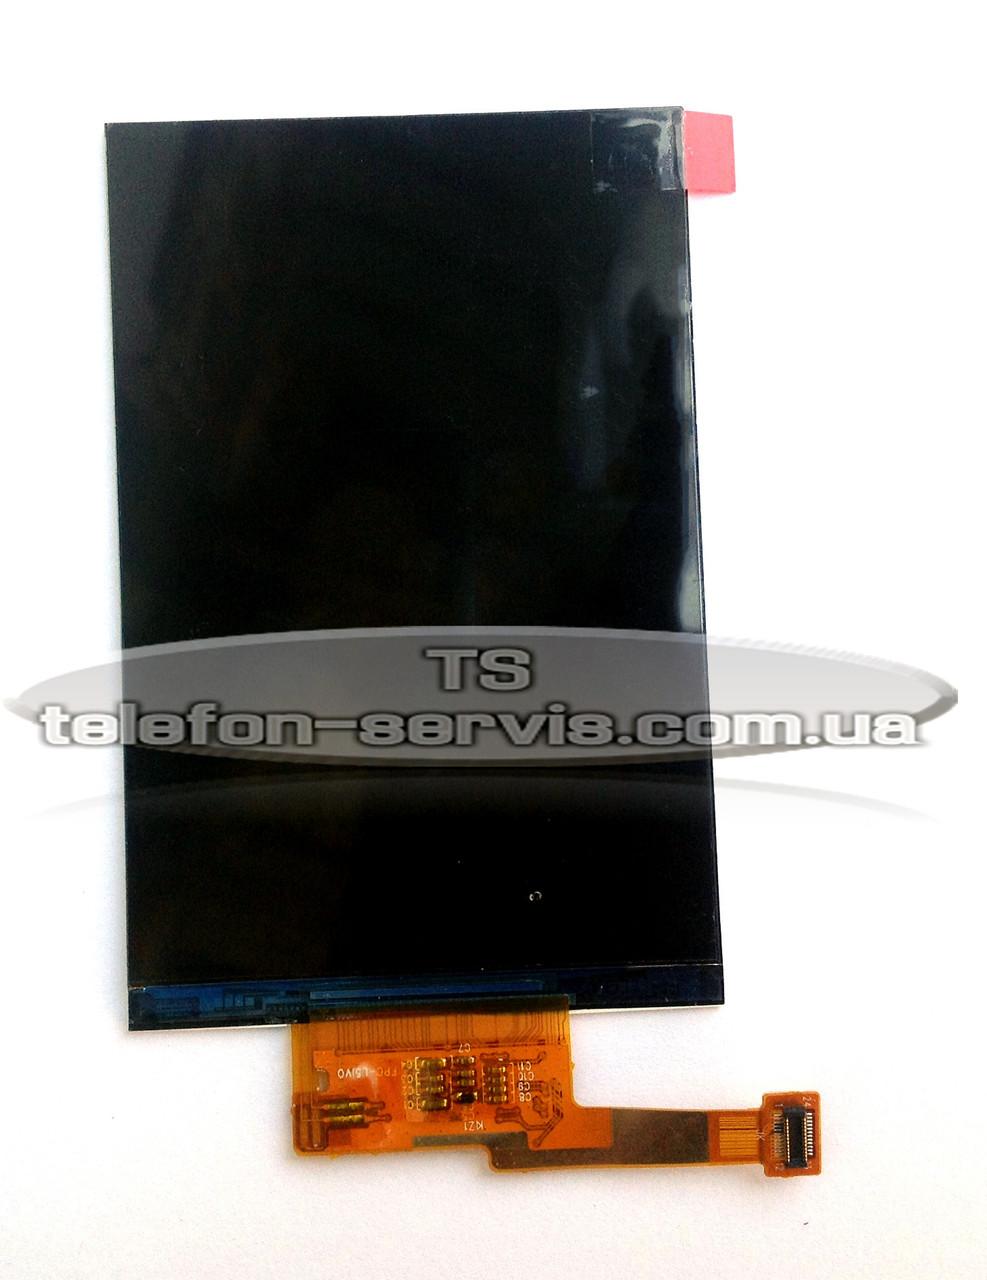 Дисплей LG E610 Optimus L5 E612 Optimus L5 E615 Optimus L5 Dual